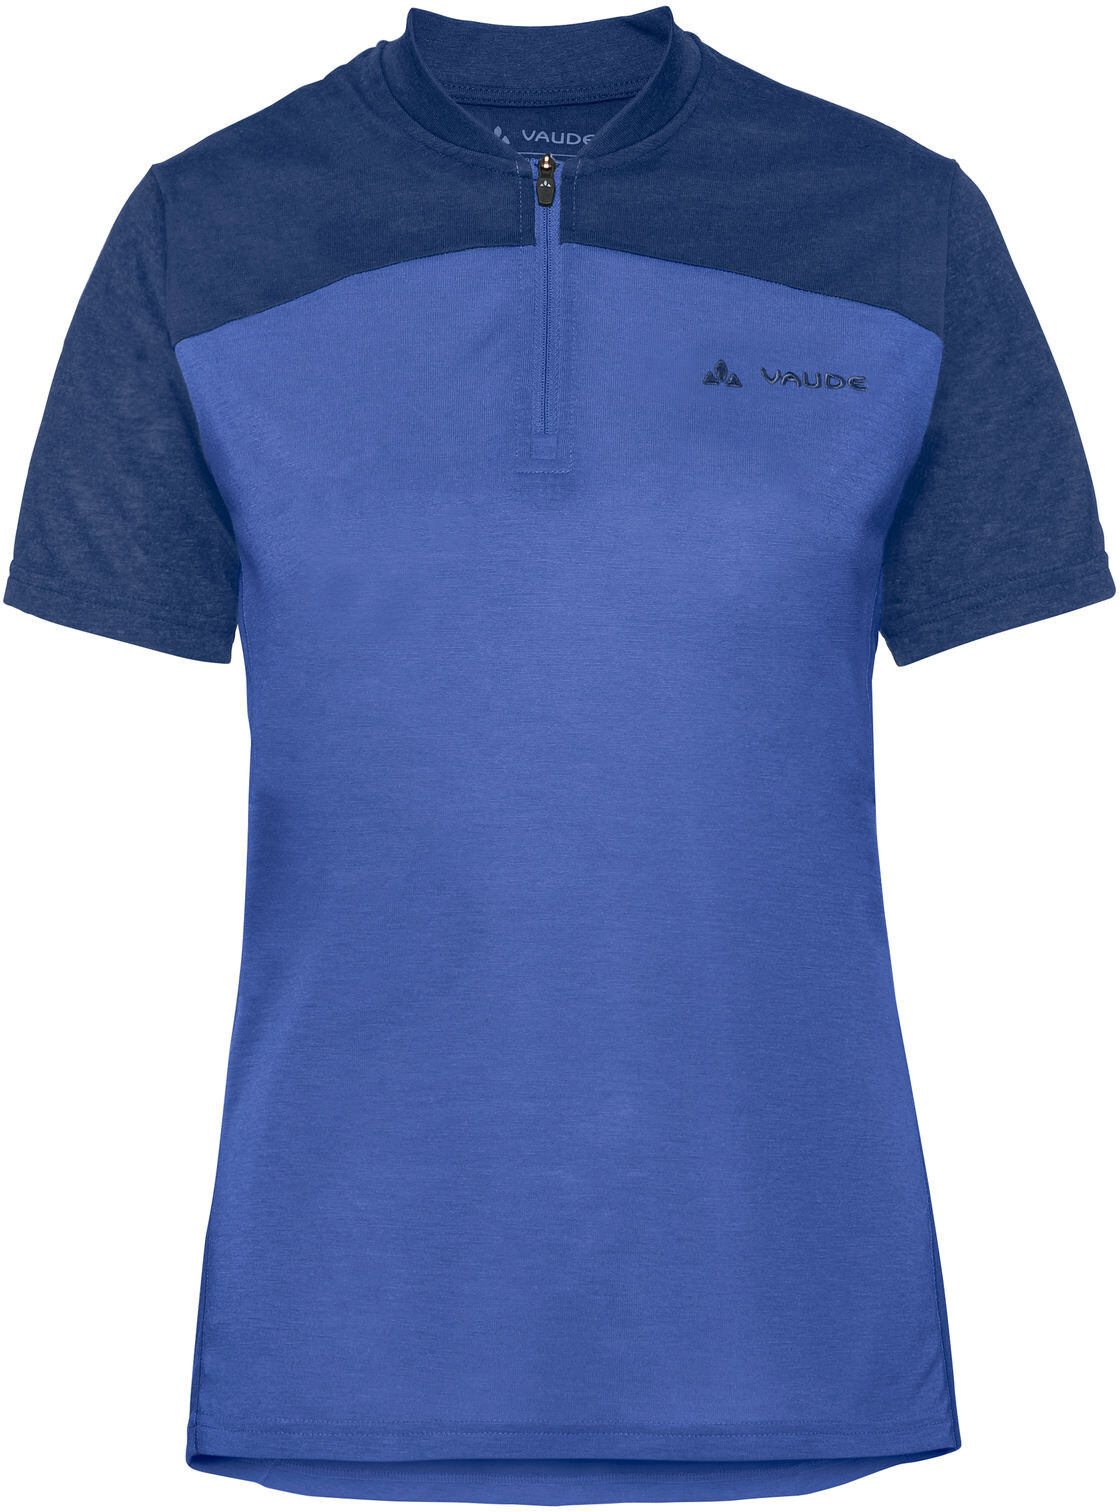 Vaude Tremalzo Iv Bike Jersey Shortsleeve Women Blue At